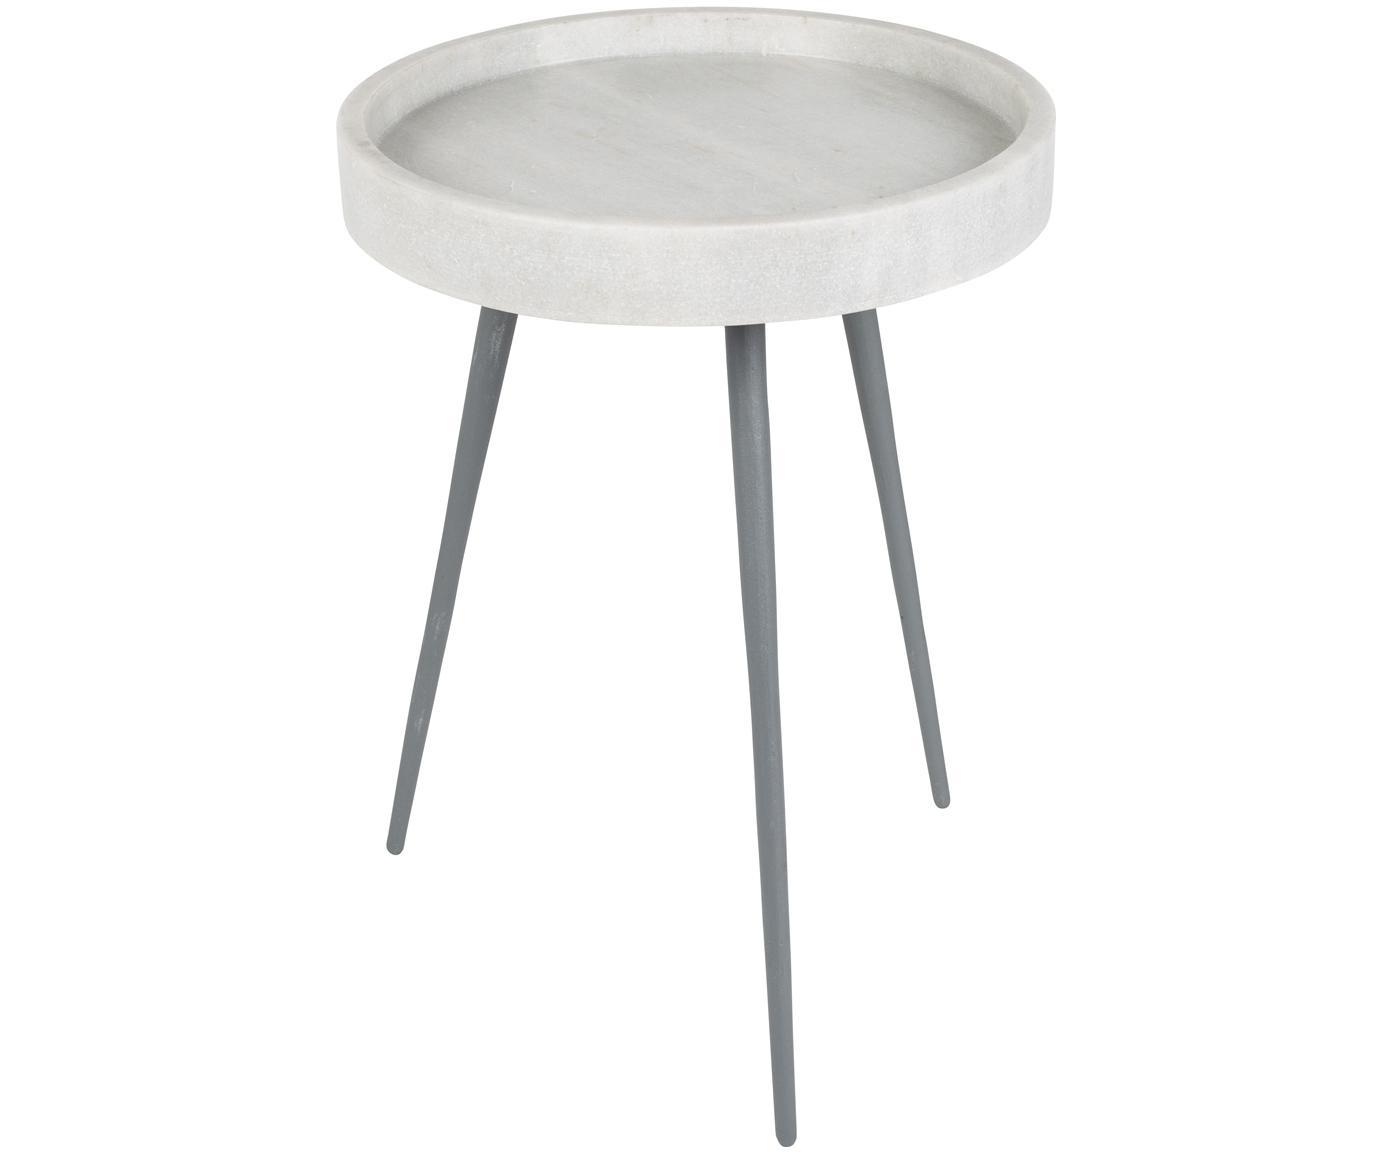 Mesa auxiliar redonda de mármol Karrara, Tablero: mármol, Patas: metal, pintura en polvo, Tablero: blanco, veteado Patas: gris, Ø 33 x Al 45 cm